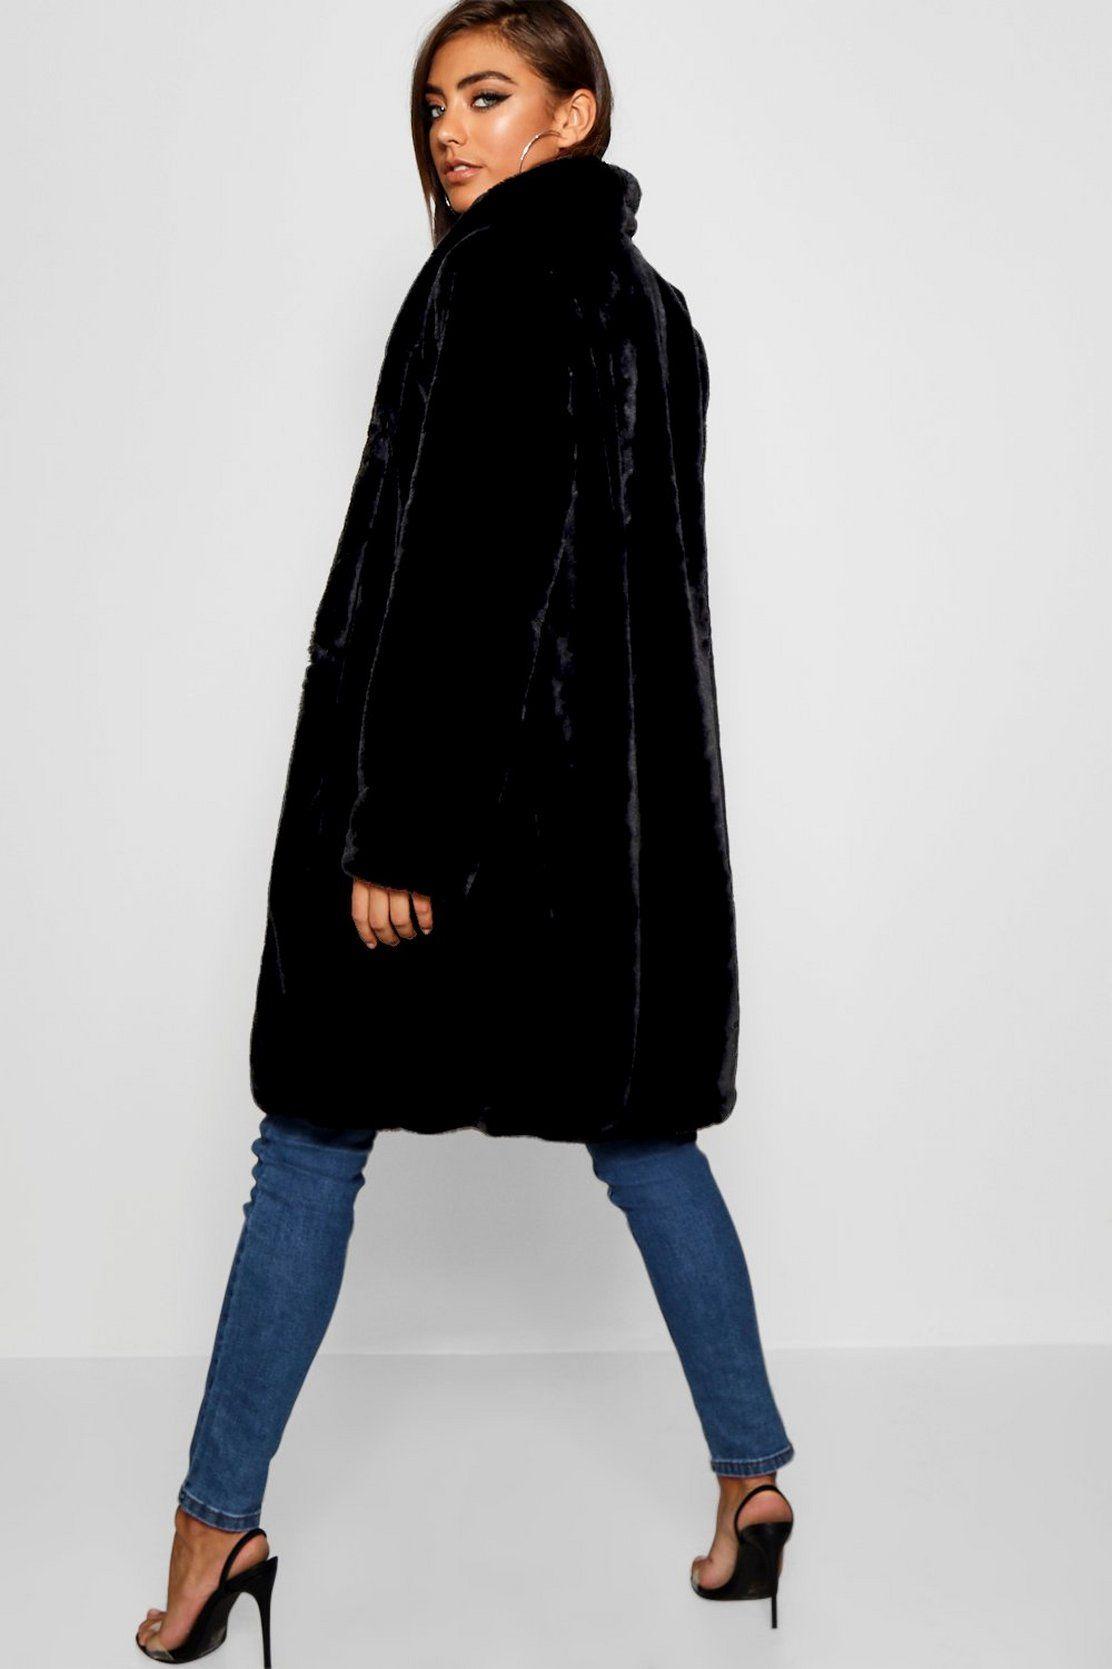 Faux Fur Coat Boohoo Womens Faux Fur Coat Black Faux Fur Coat Faux Fur Coat